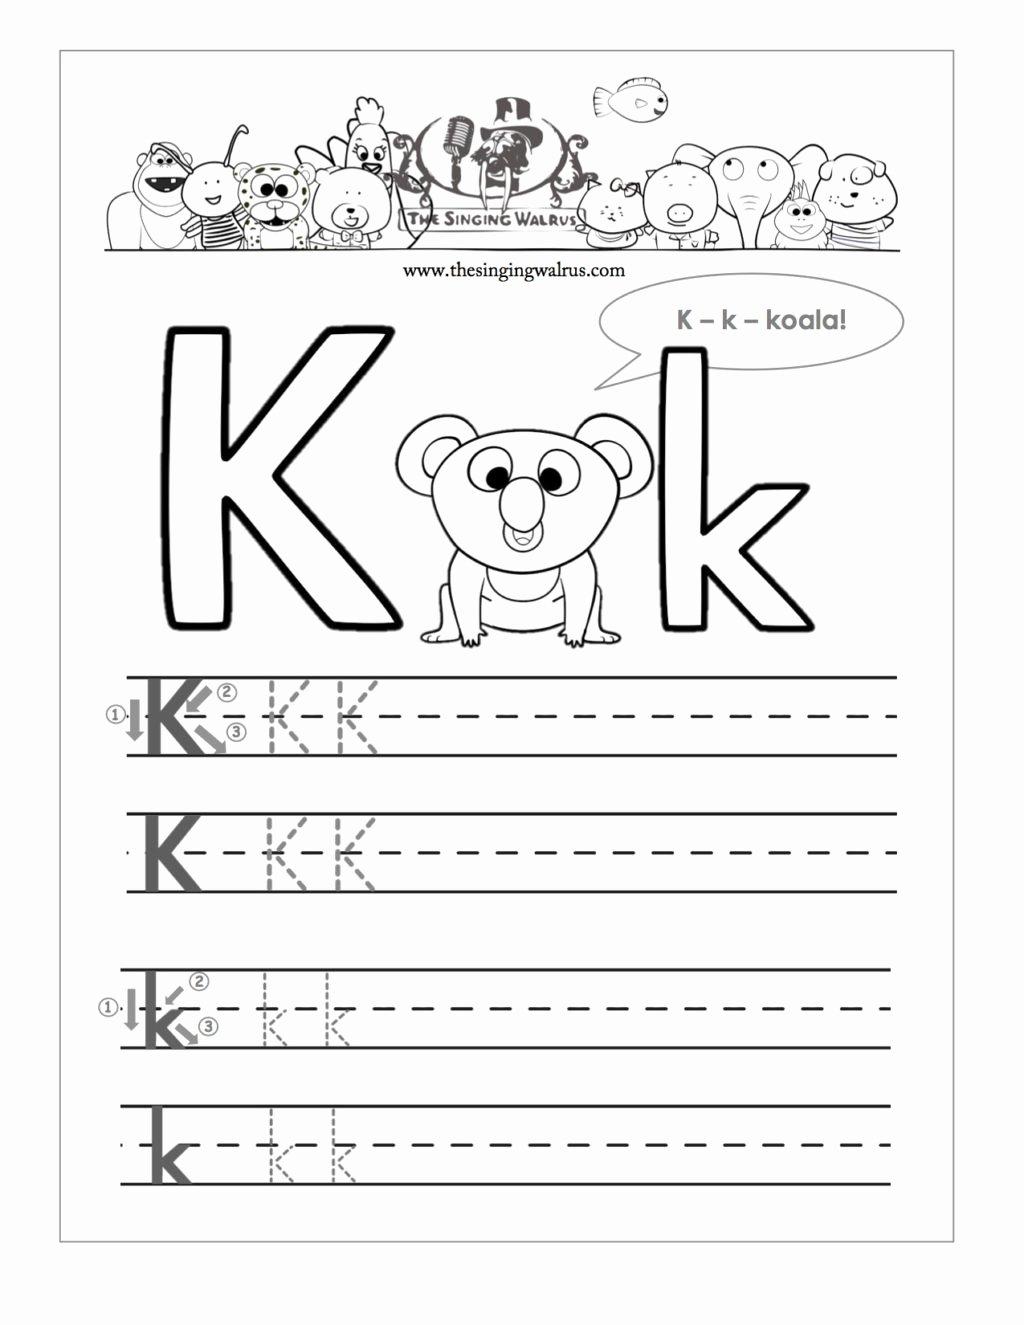 Learning Worksheets for Preschoolers Inspirational Worksheet Learning Worksheets for Preschoolers Worksheet